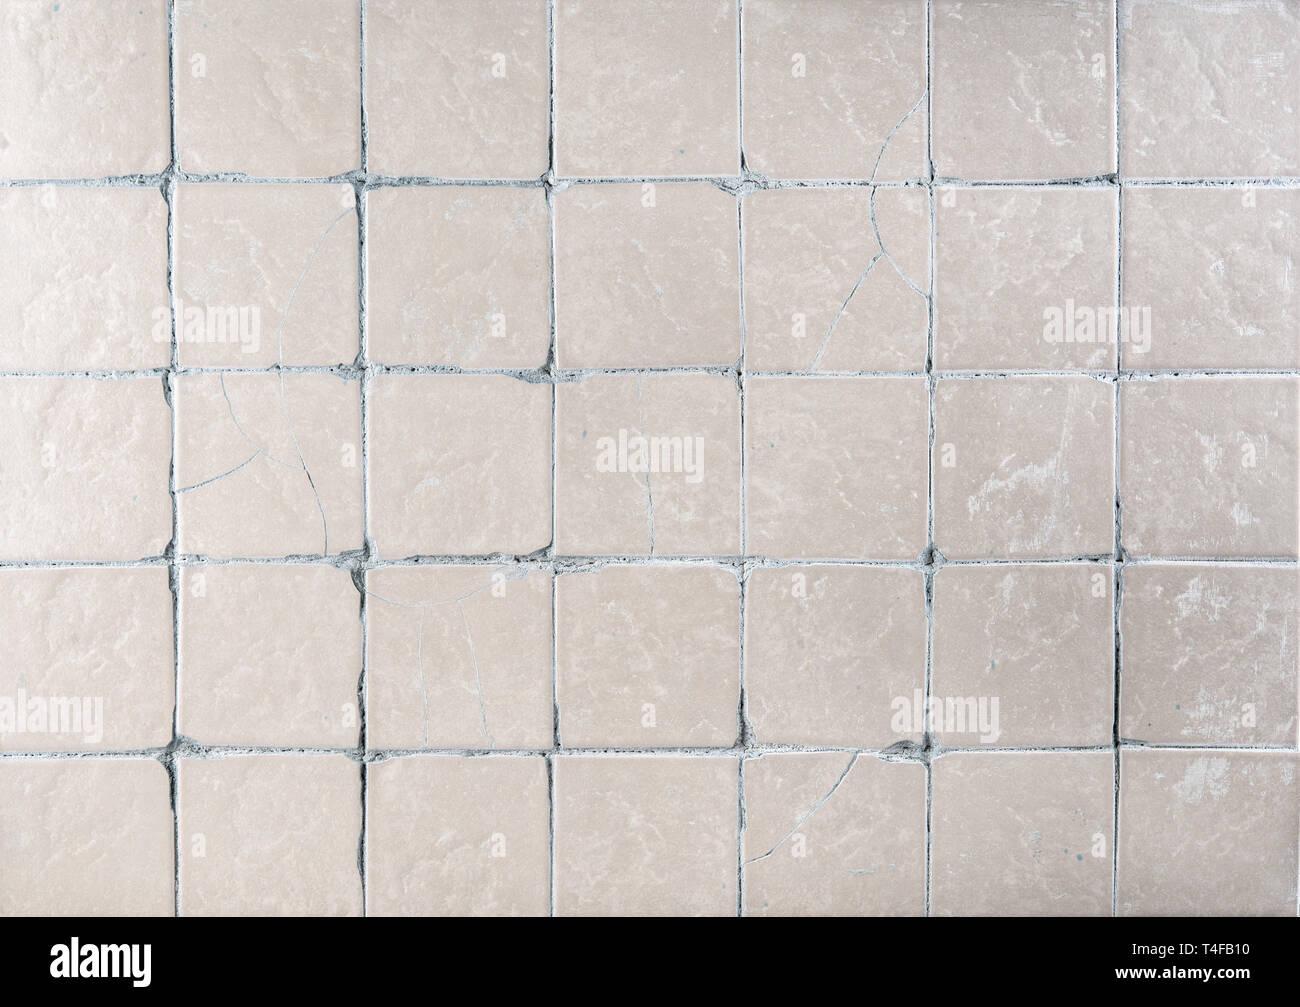 Background texture of retro kitchen ceramic tiles, close-up ...